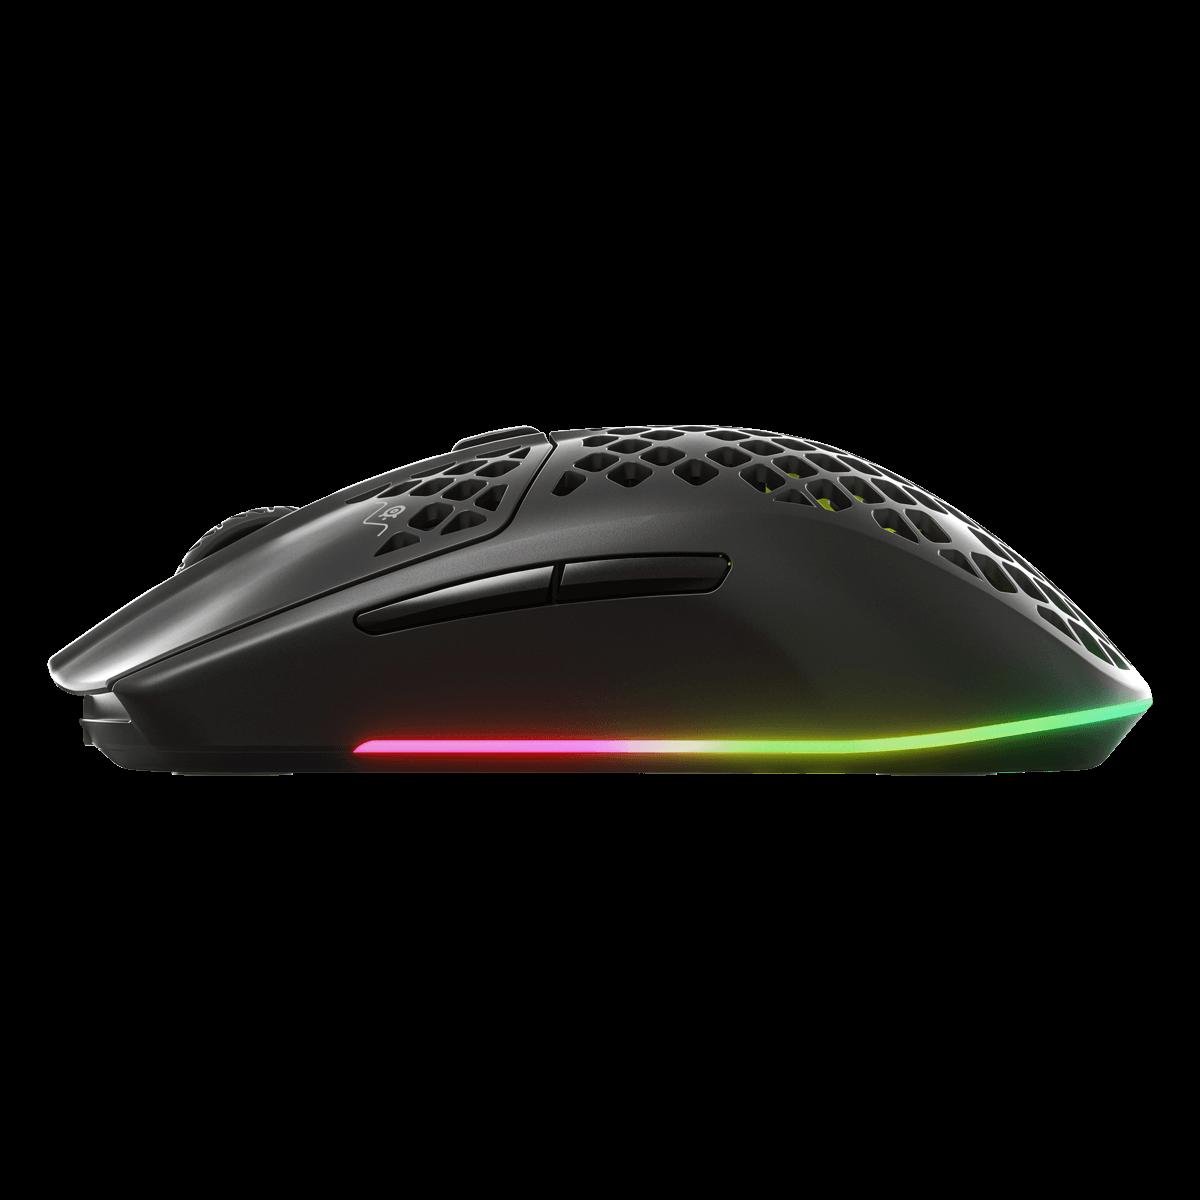 SteelSeries Aerox 3 超輕量無線遊戲滑鼠